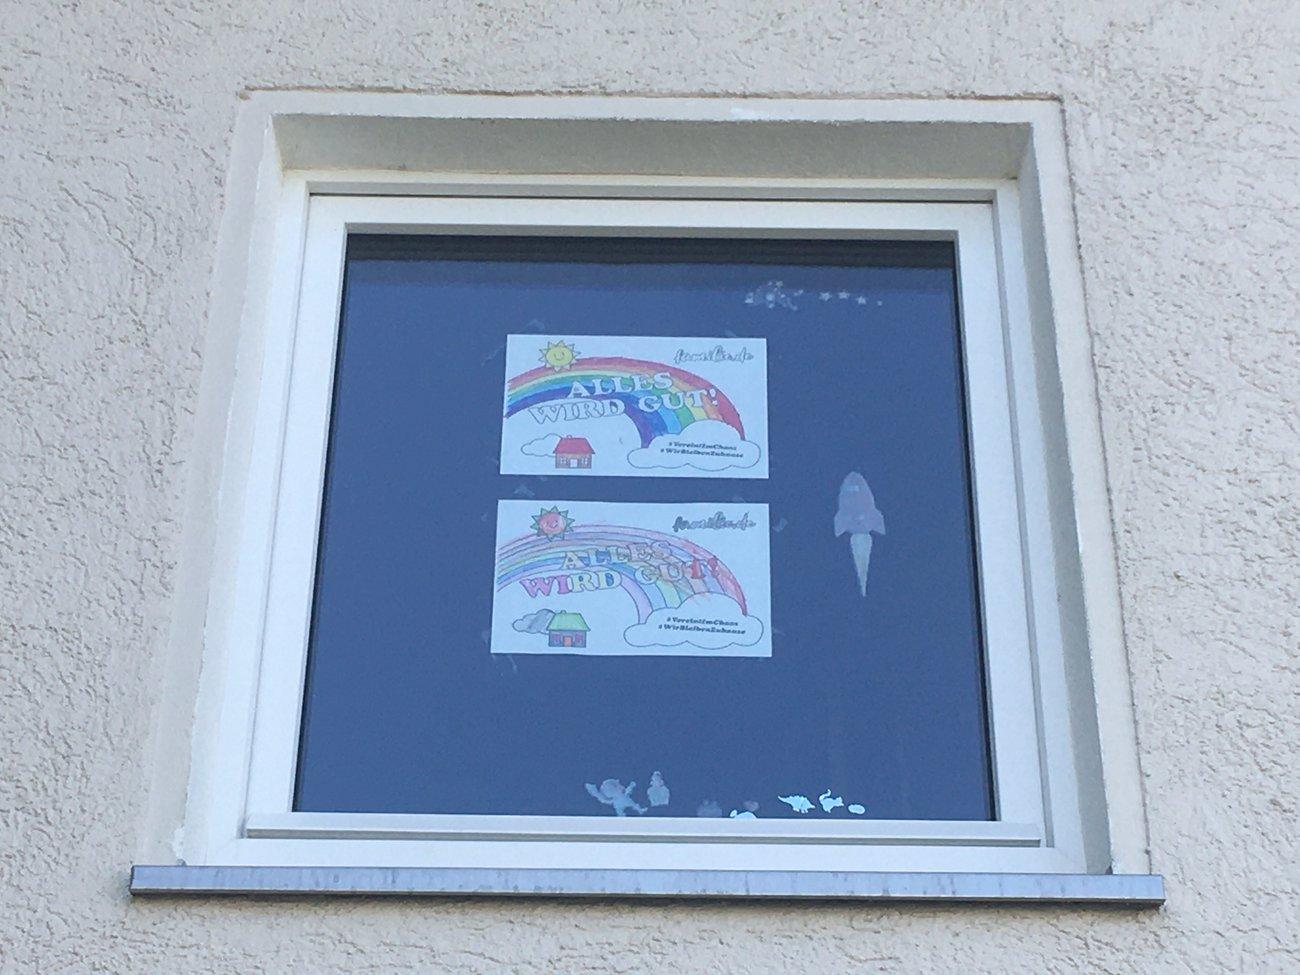 fertiges Ausmalbild im Fenster